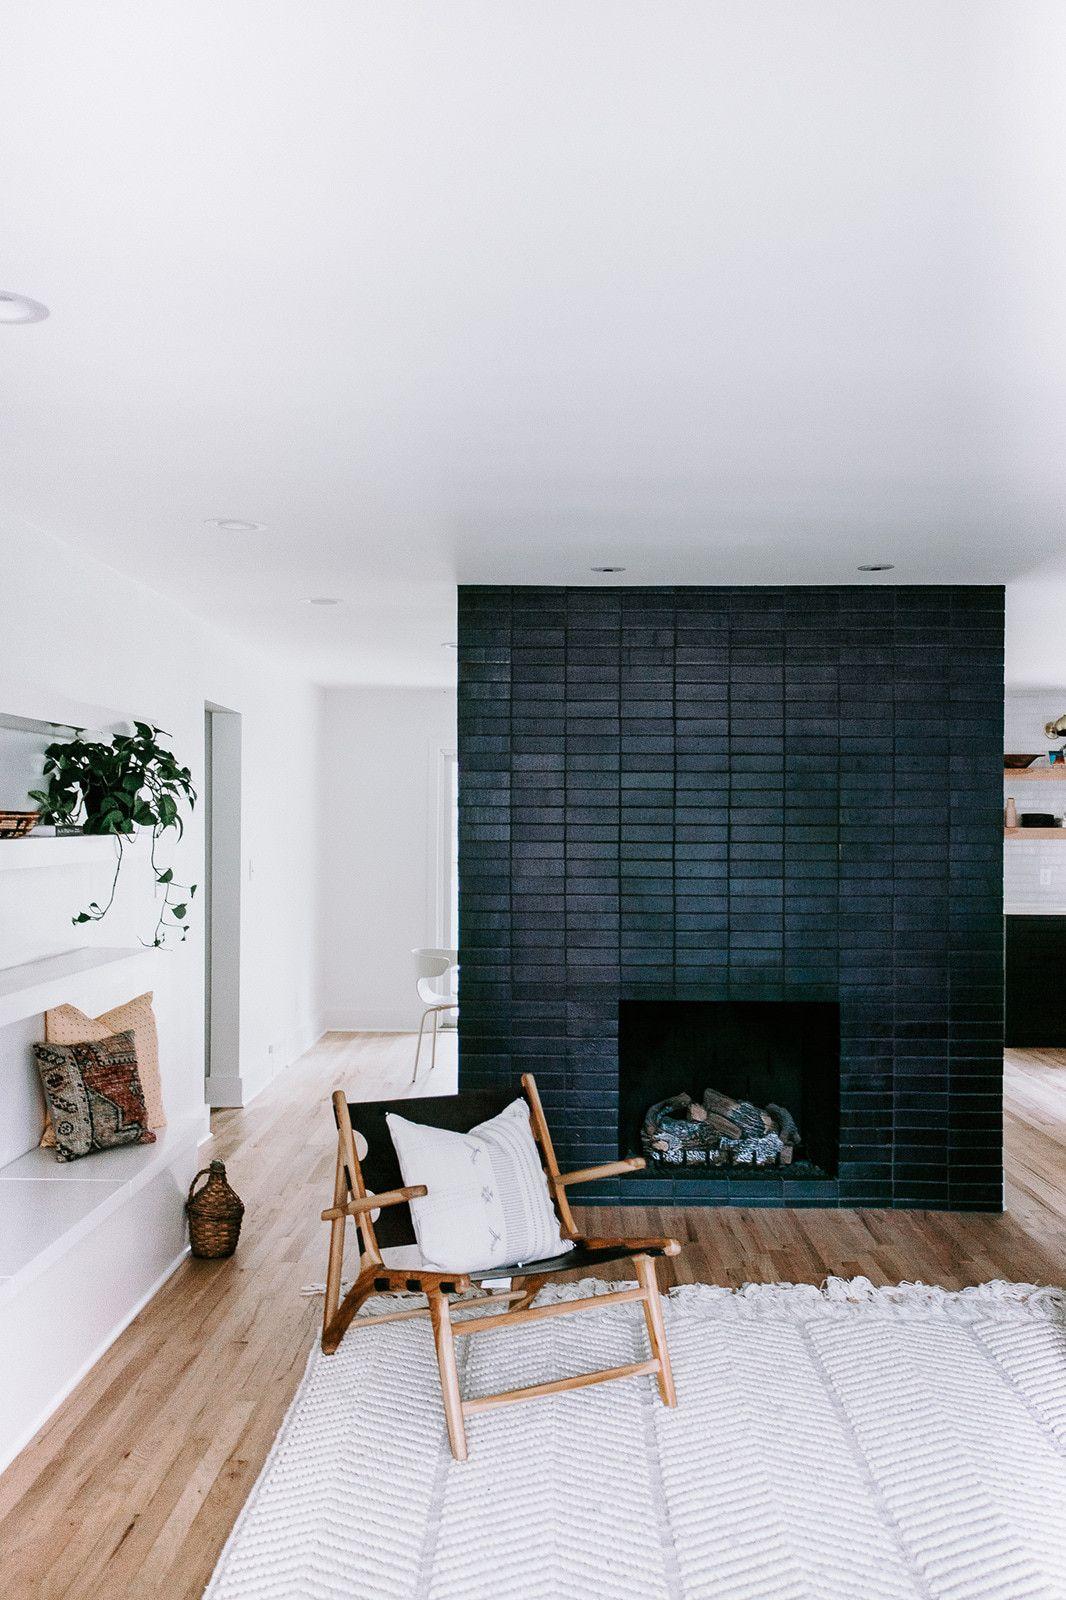 Fireplace Surround In Glazed Thin Brick